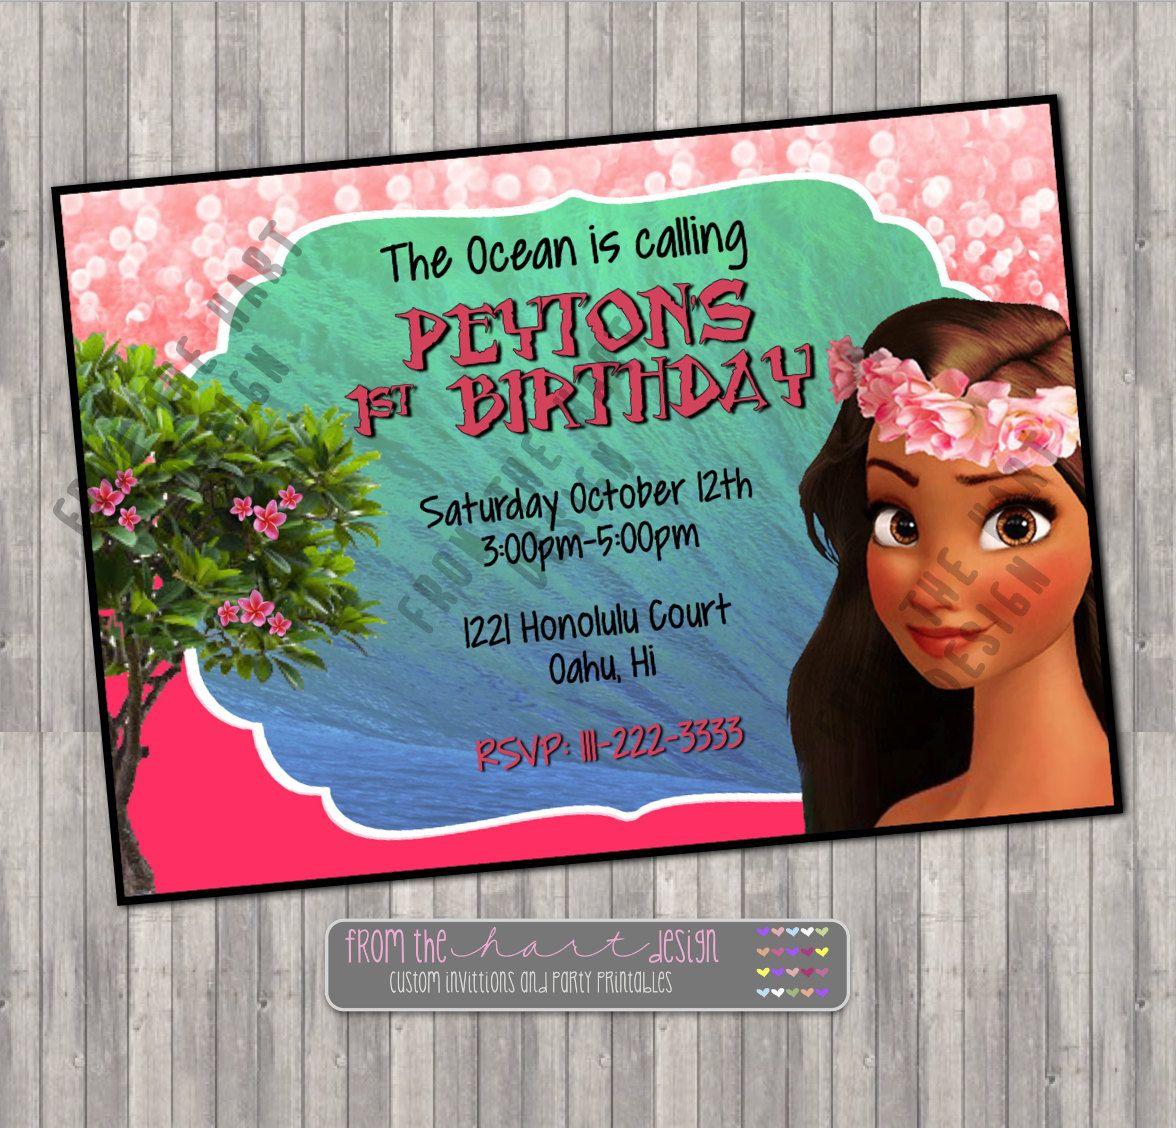 birthday party invitations printable%0A Moana Invitation  Moana Birthday Party  Moana Birthday Invitation  Disney  Princess Moana  Wild Girl  Personalized  Printable  Digital File